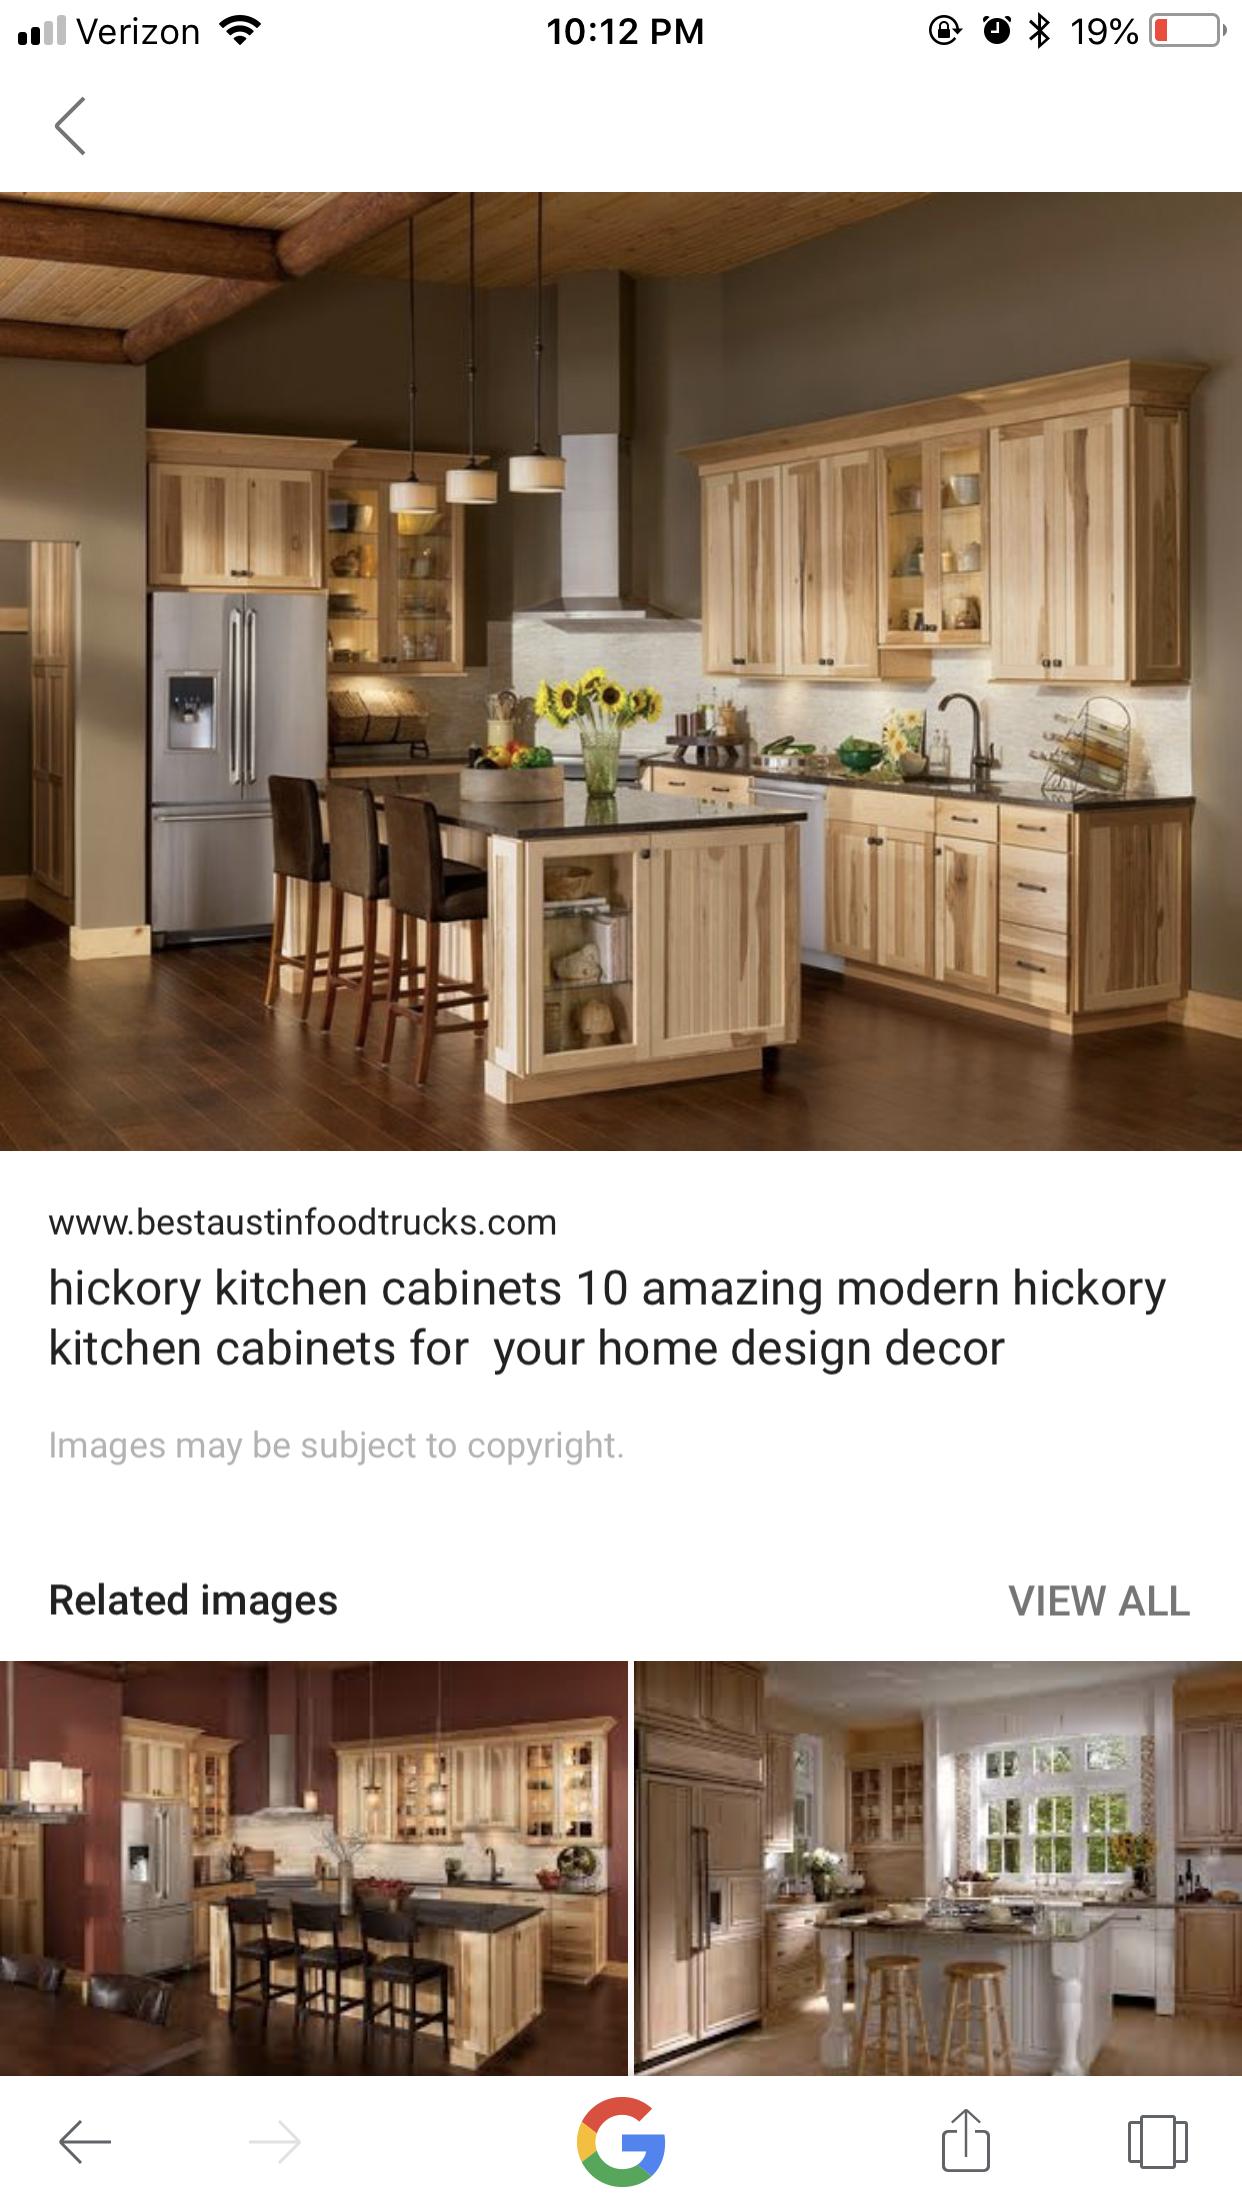 Pin by Ellie Covarrubias on Kitchen ideas | Kitchen colors ...